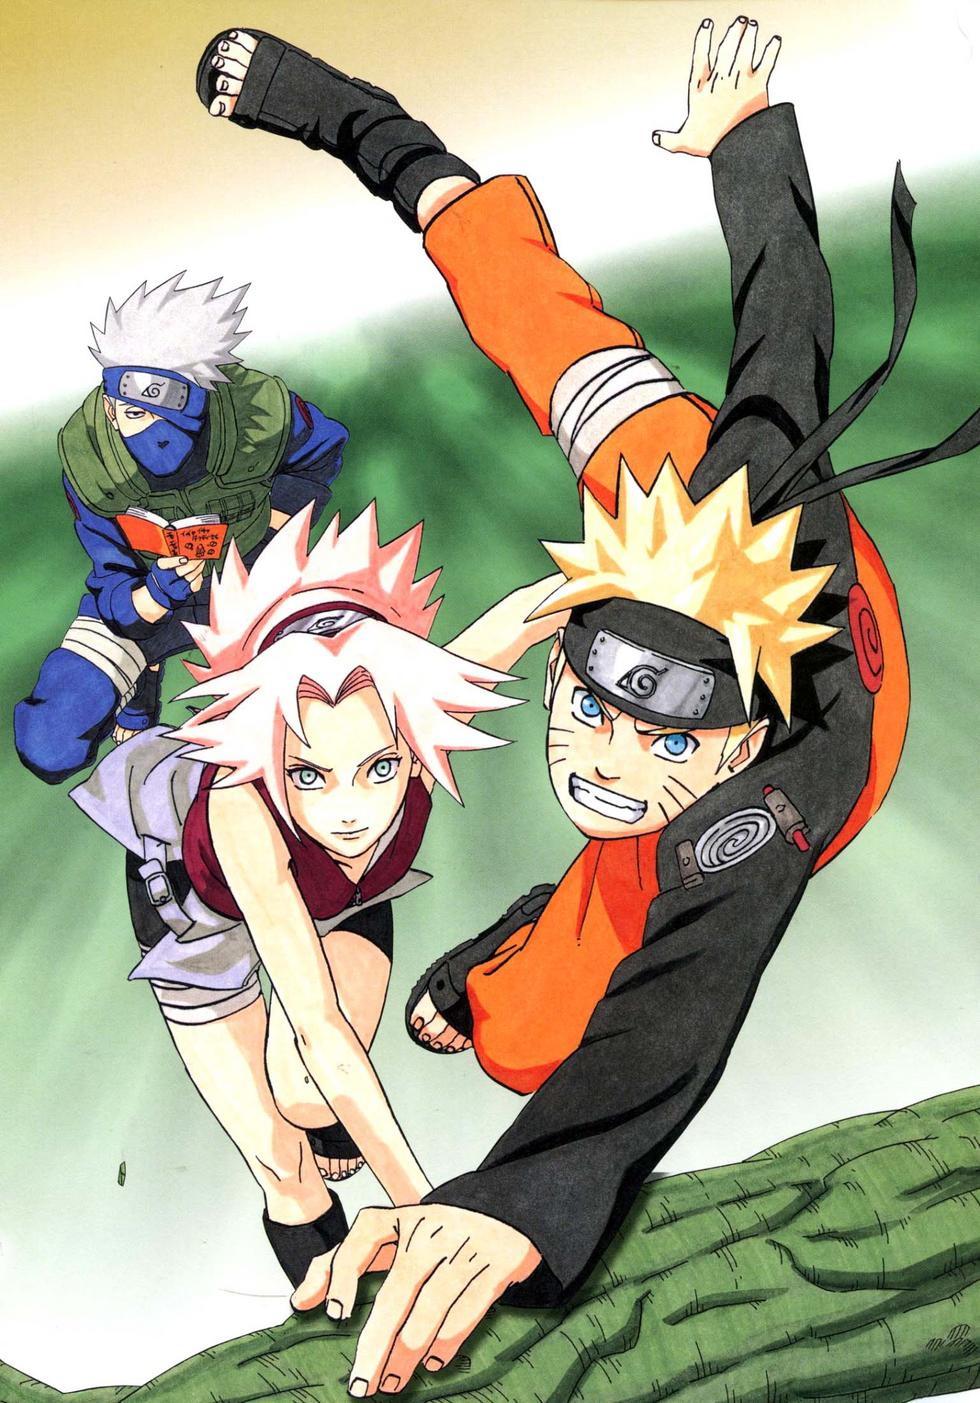 Cosplay Heaven: Top 7 Classic Anime Series